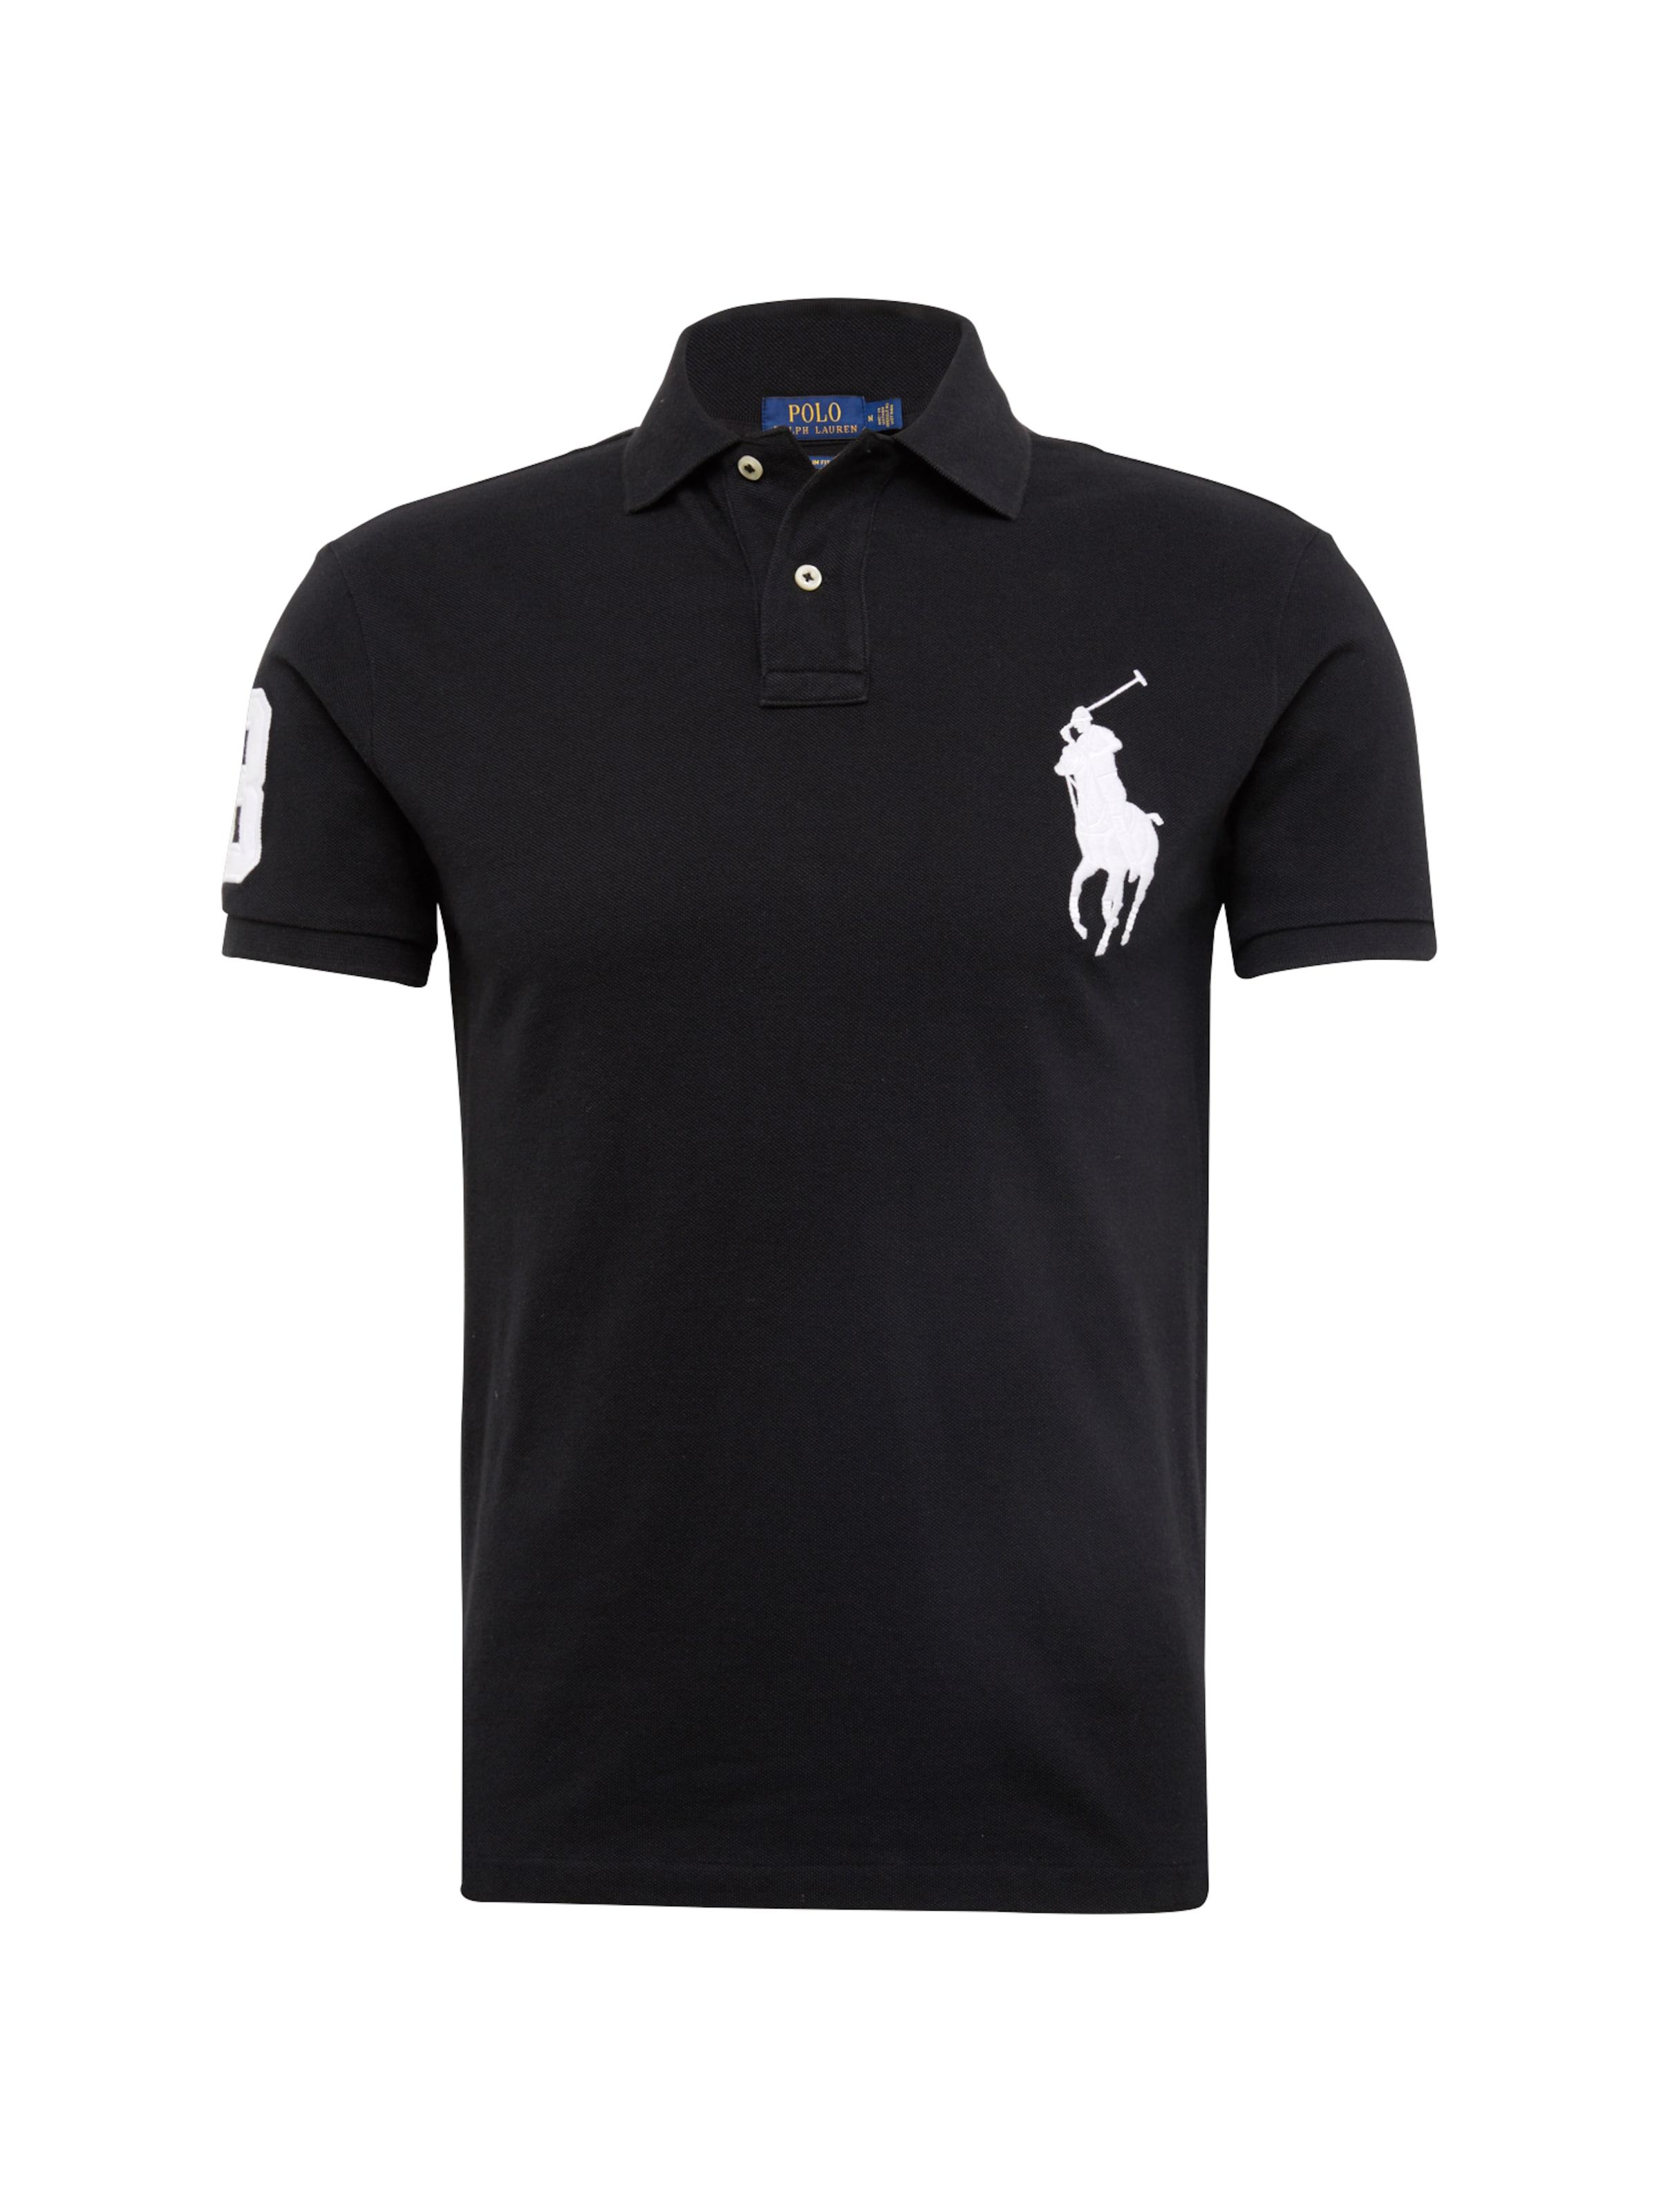 Polo shirt Ralph Sleeve 'sskcbppslm T Lauren short En Noir knit' EDH9W2I